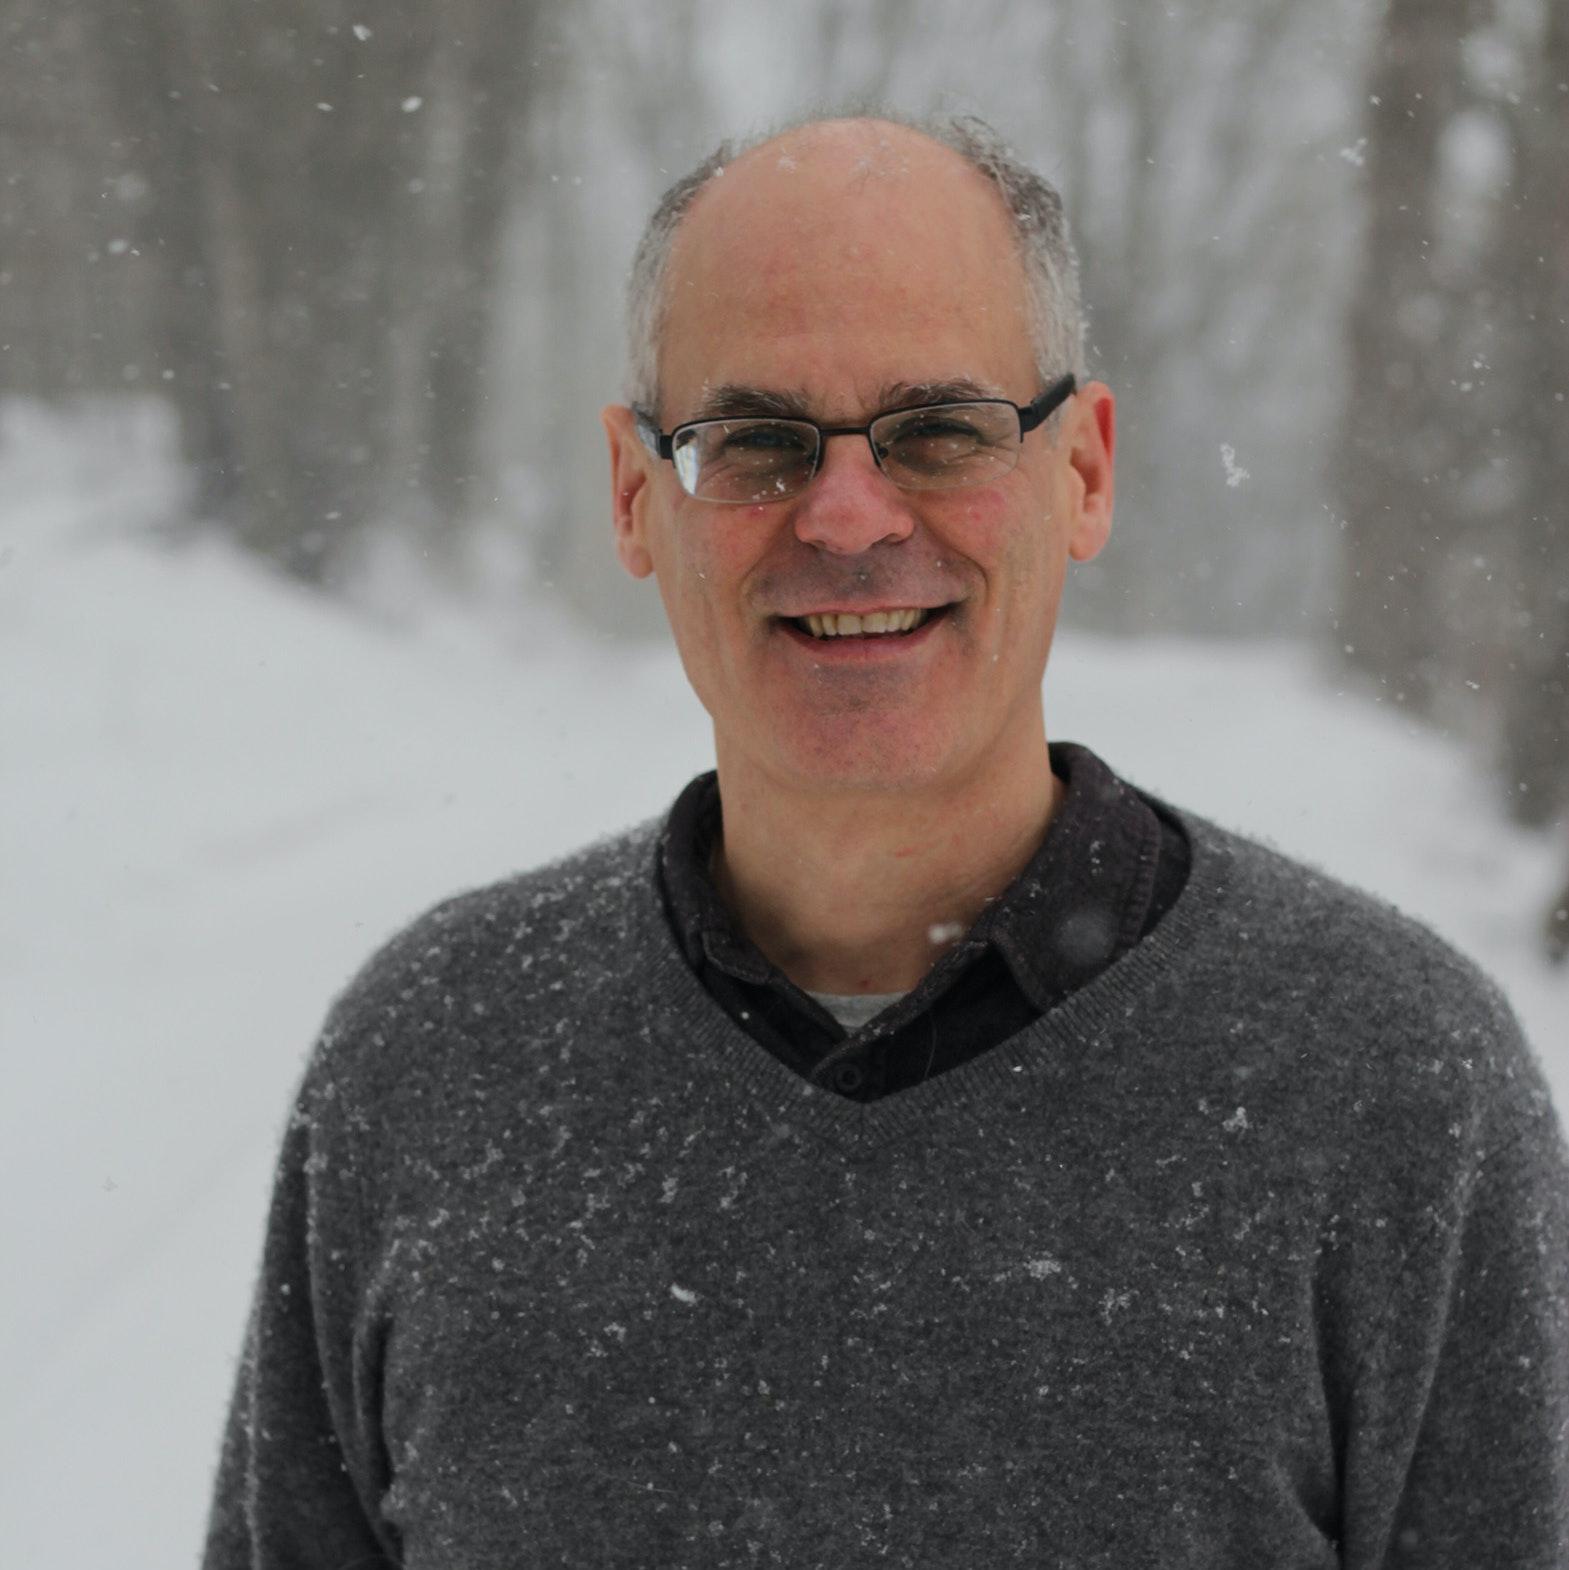 Headshot of James Sturm